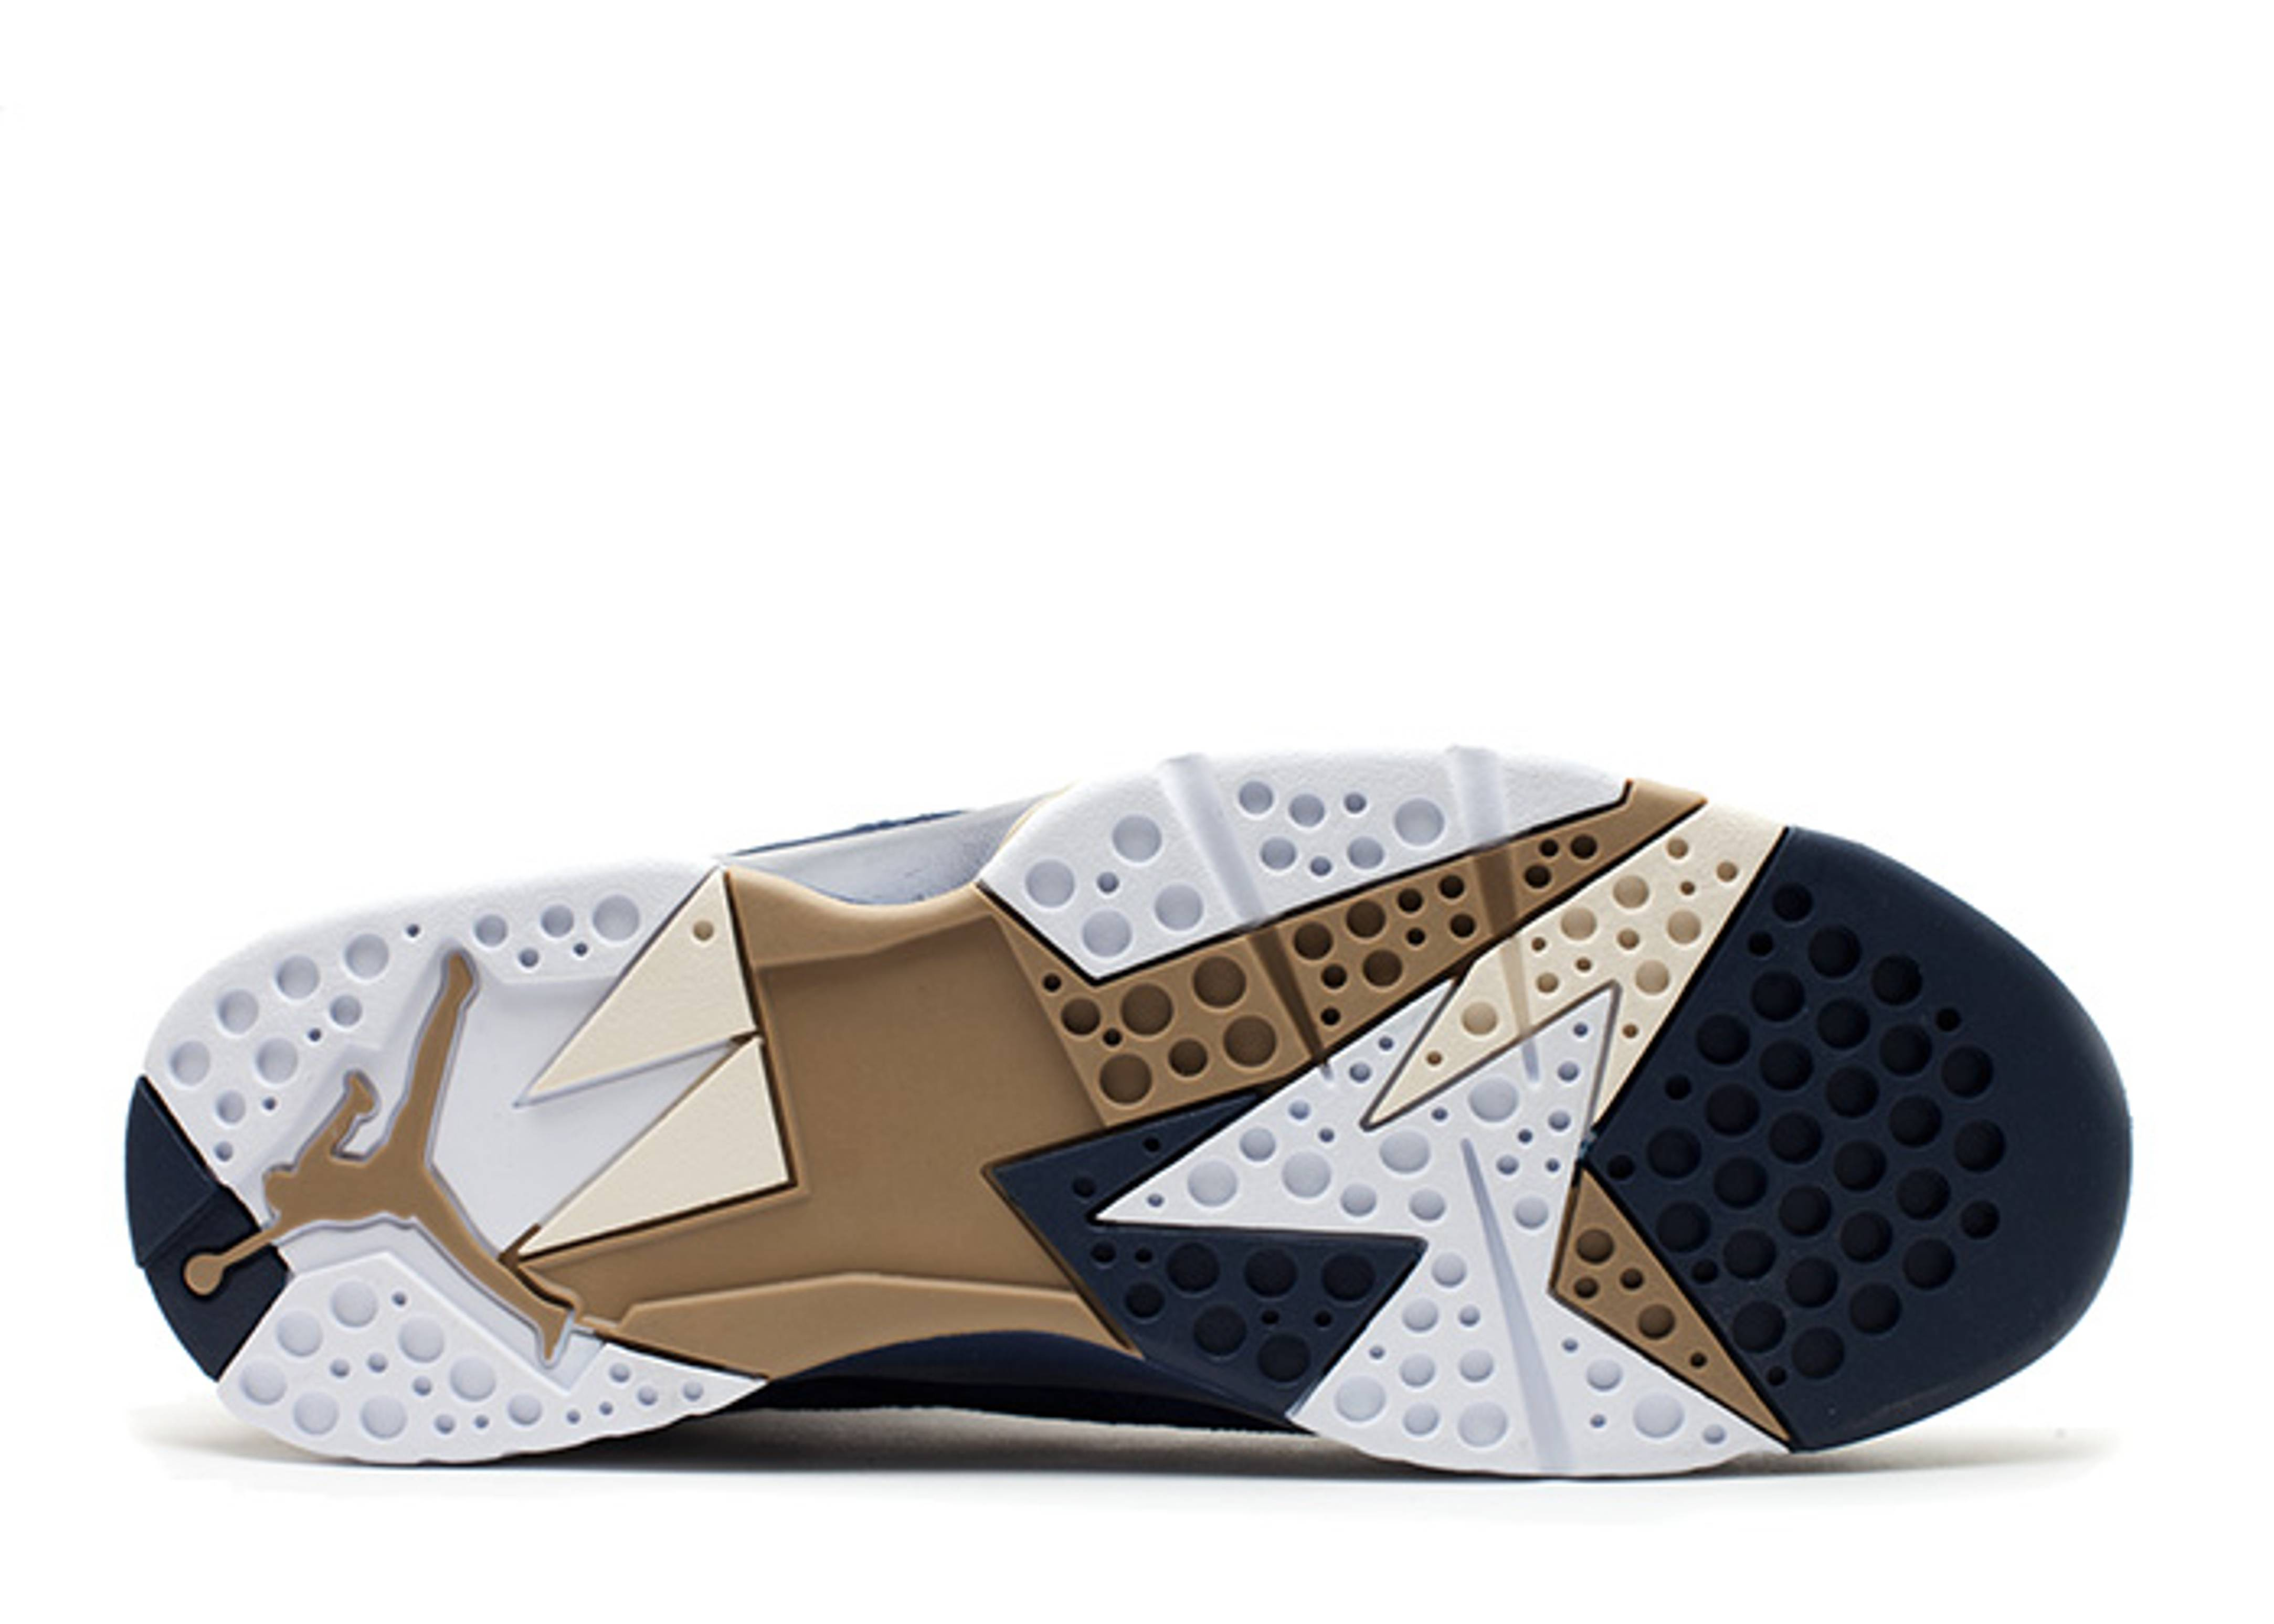 sale retailer 5ec33 e99d4 Air Jordan 7 Retro J2k